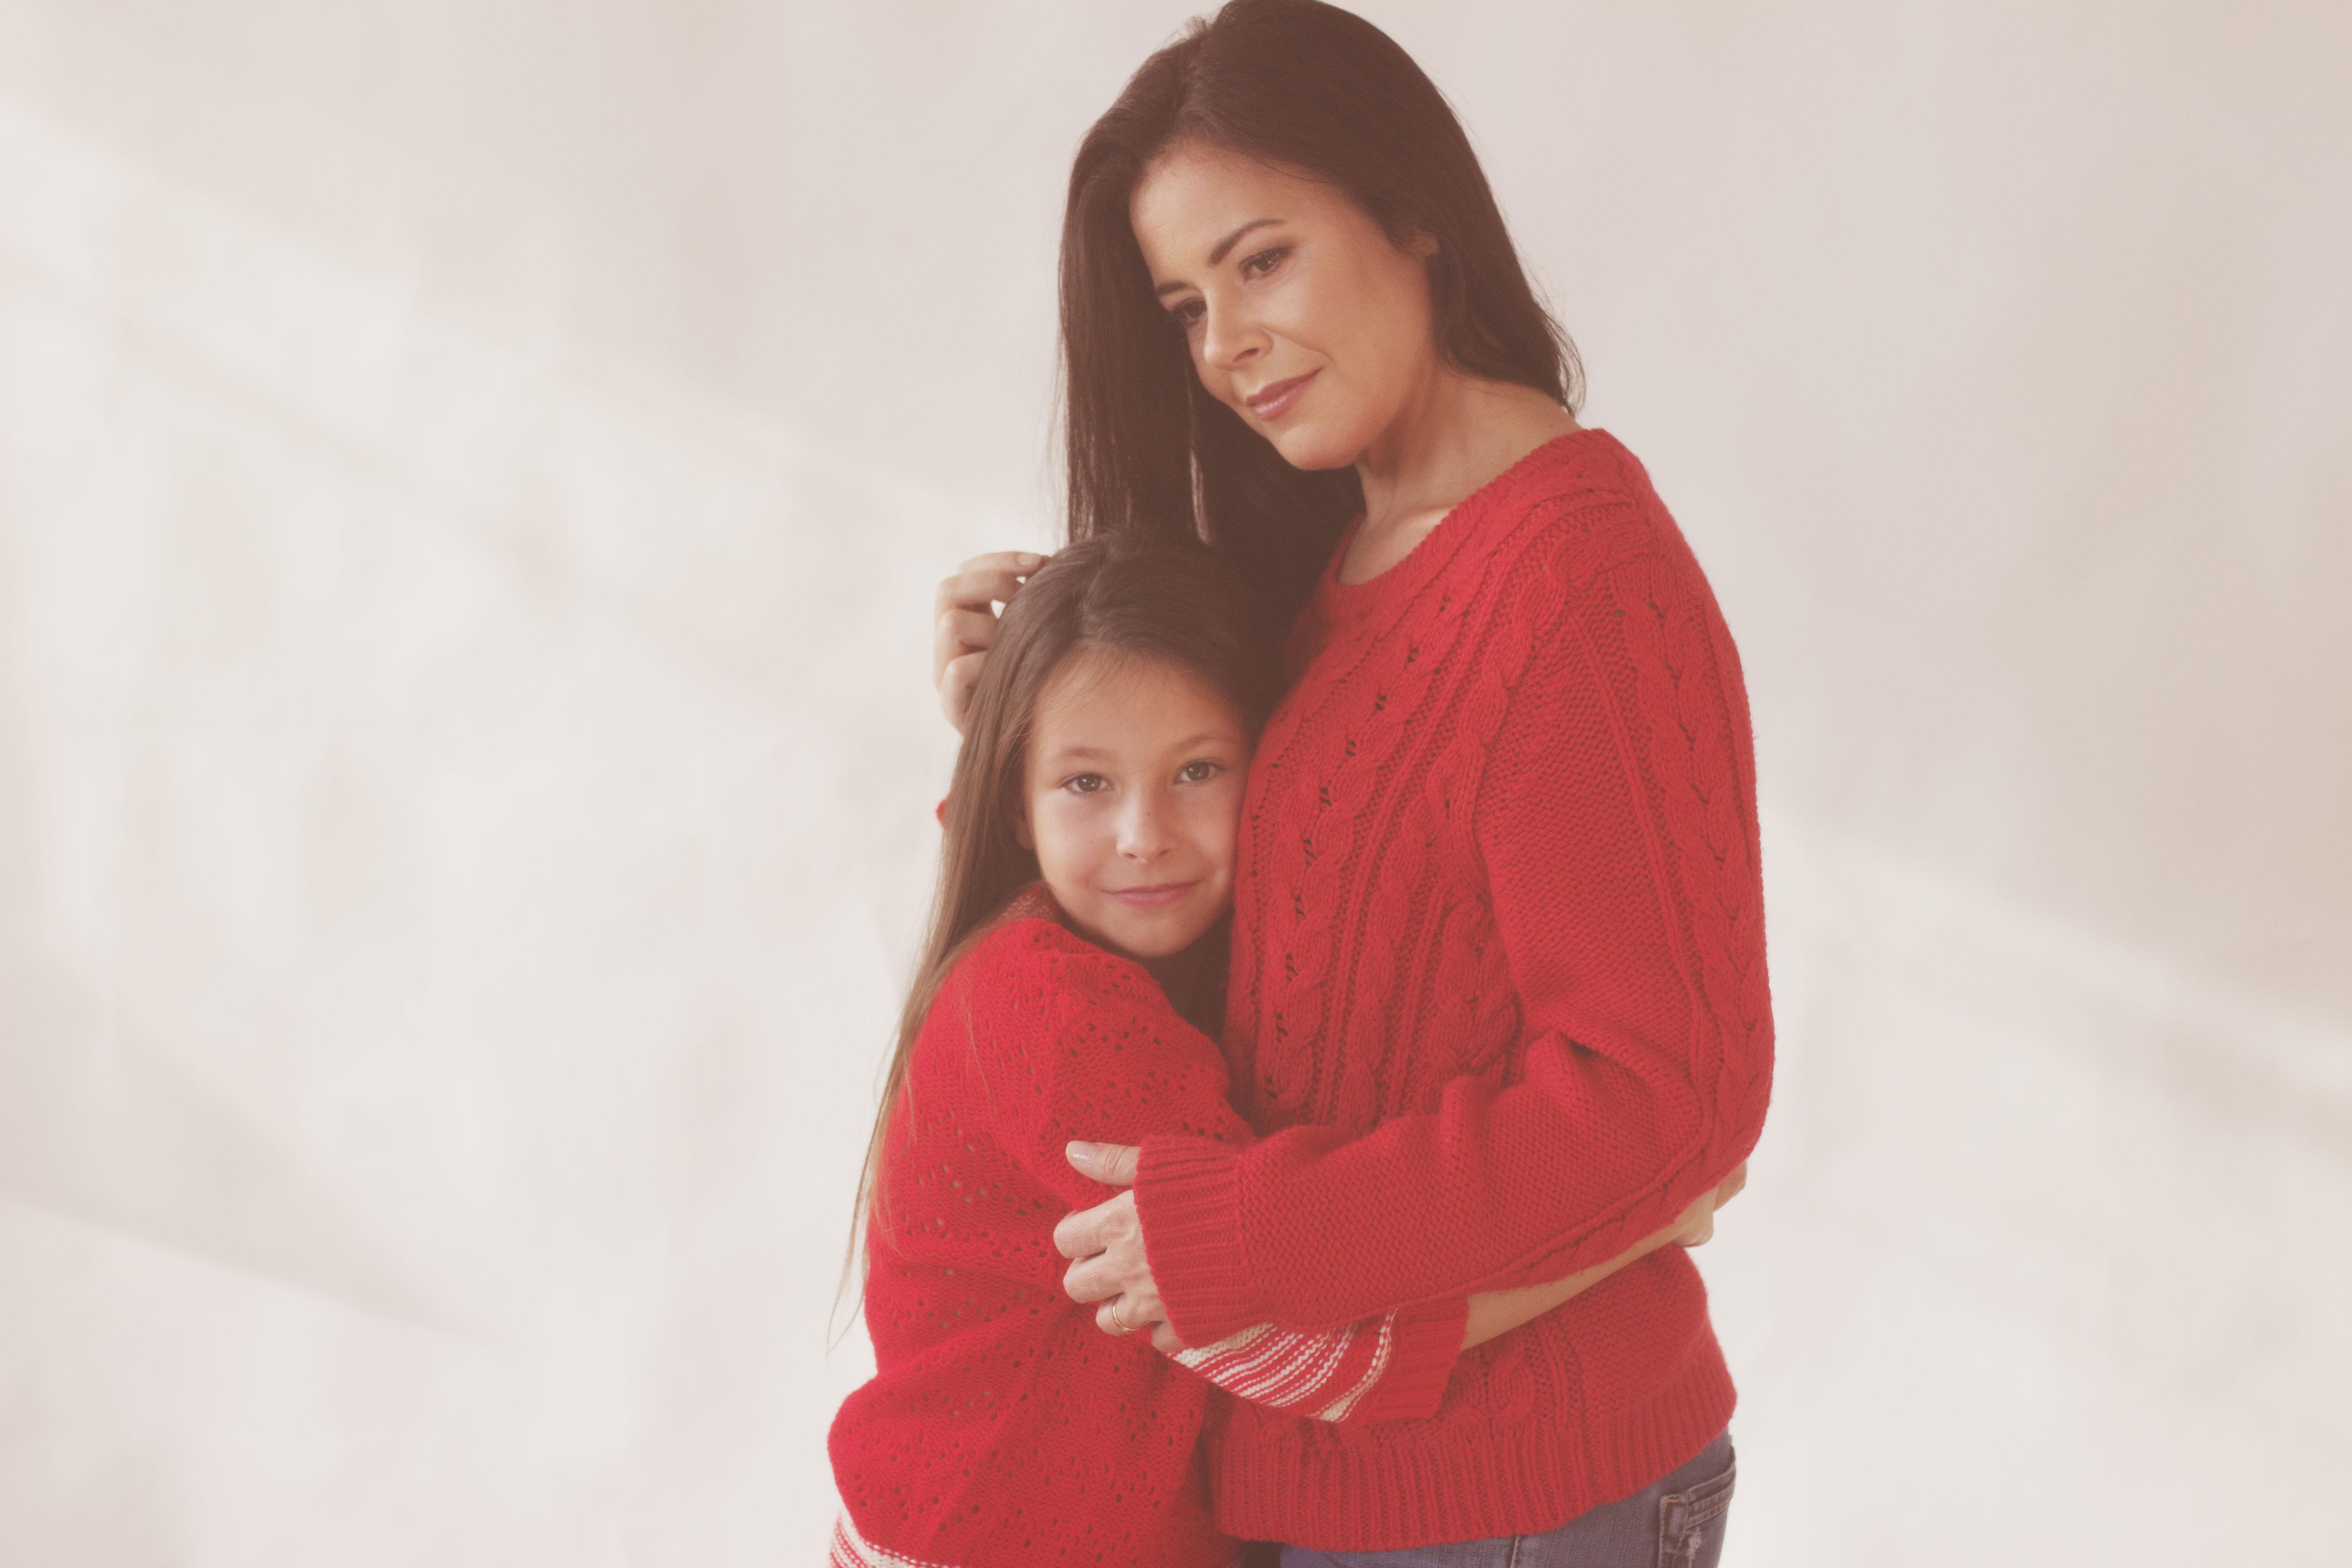 portrait mère fille en pull rouge